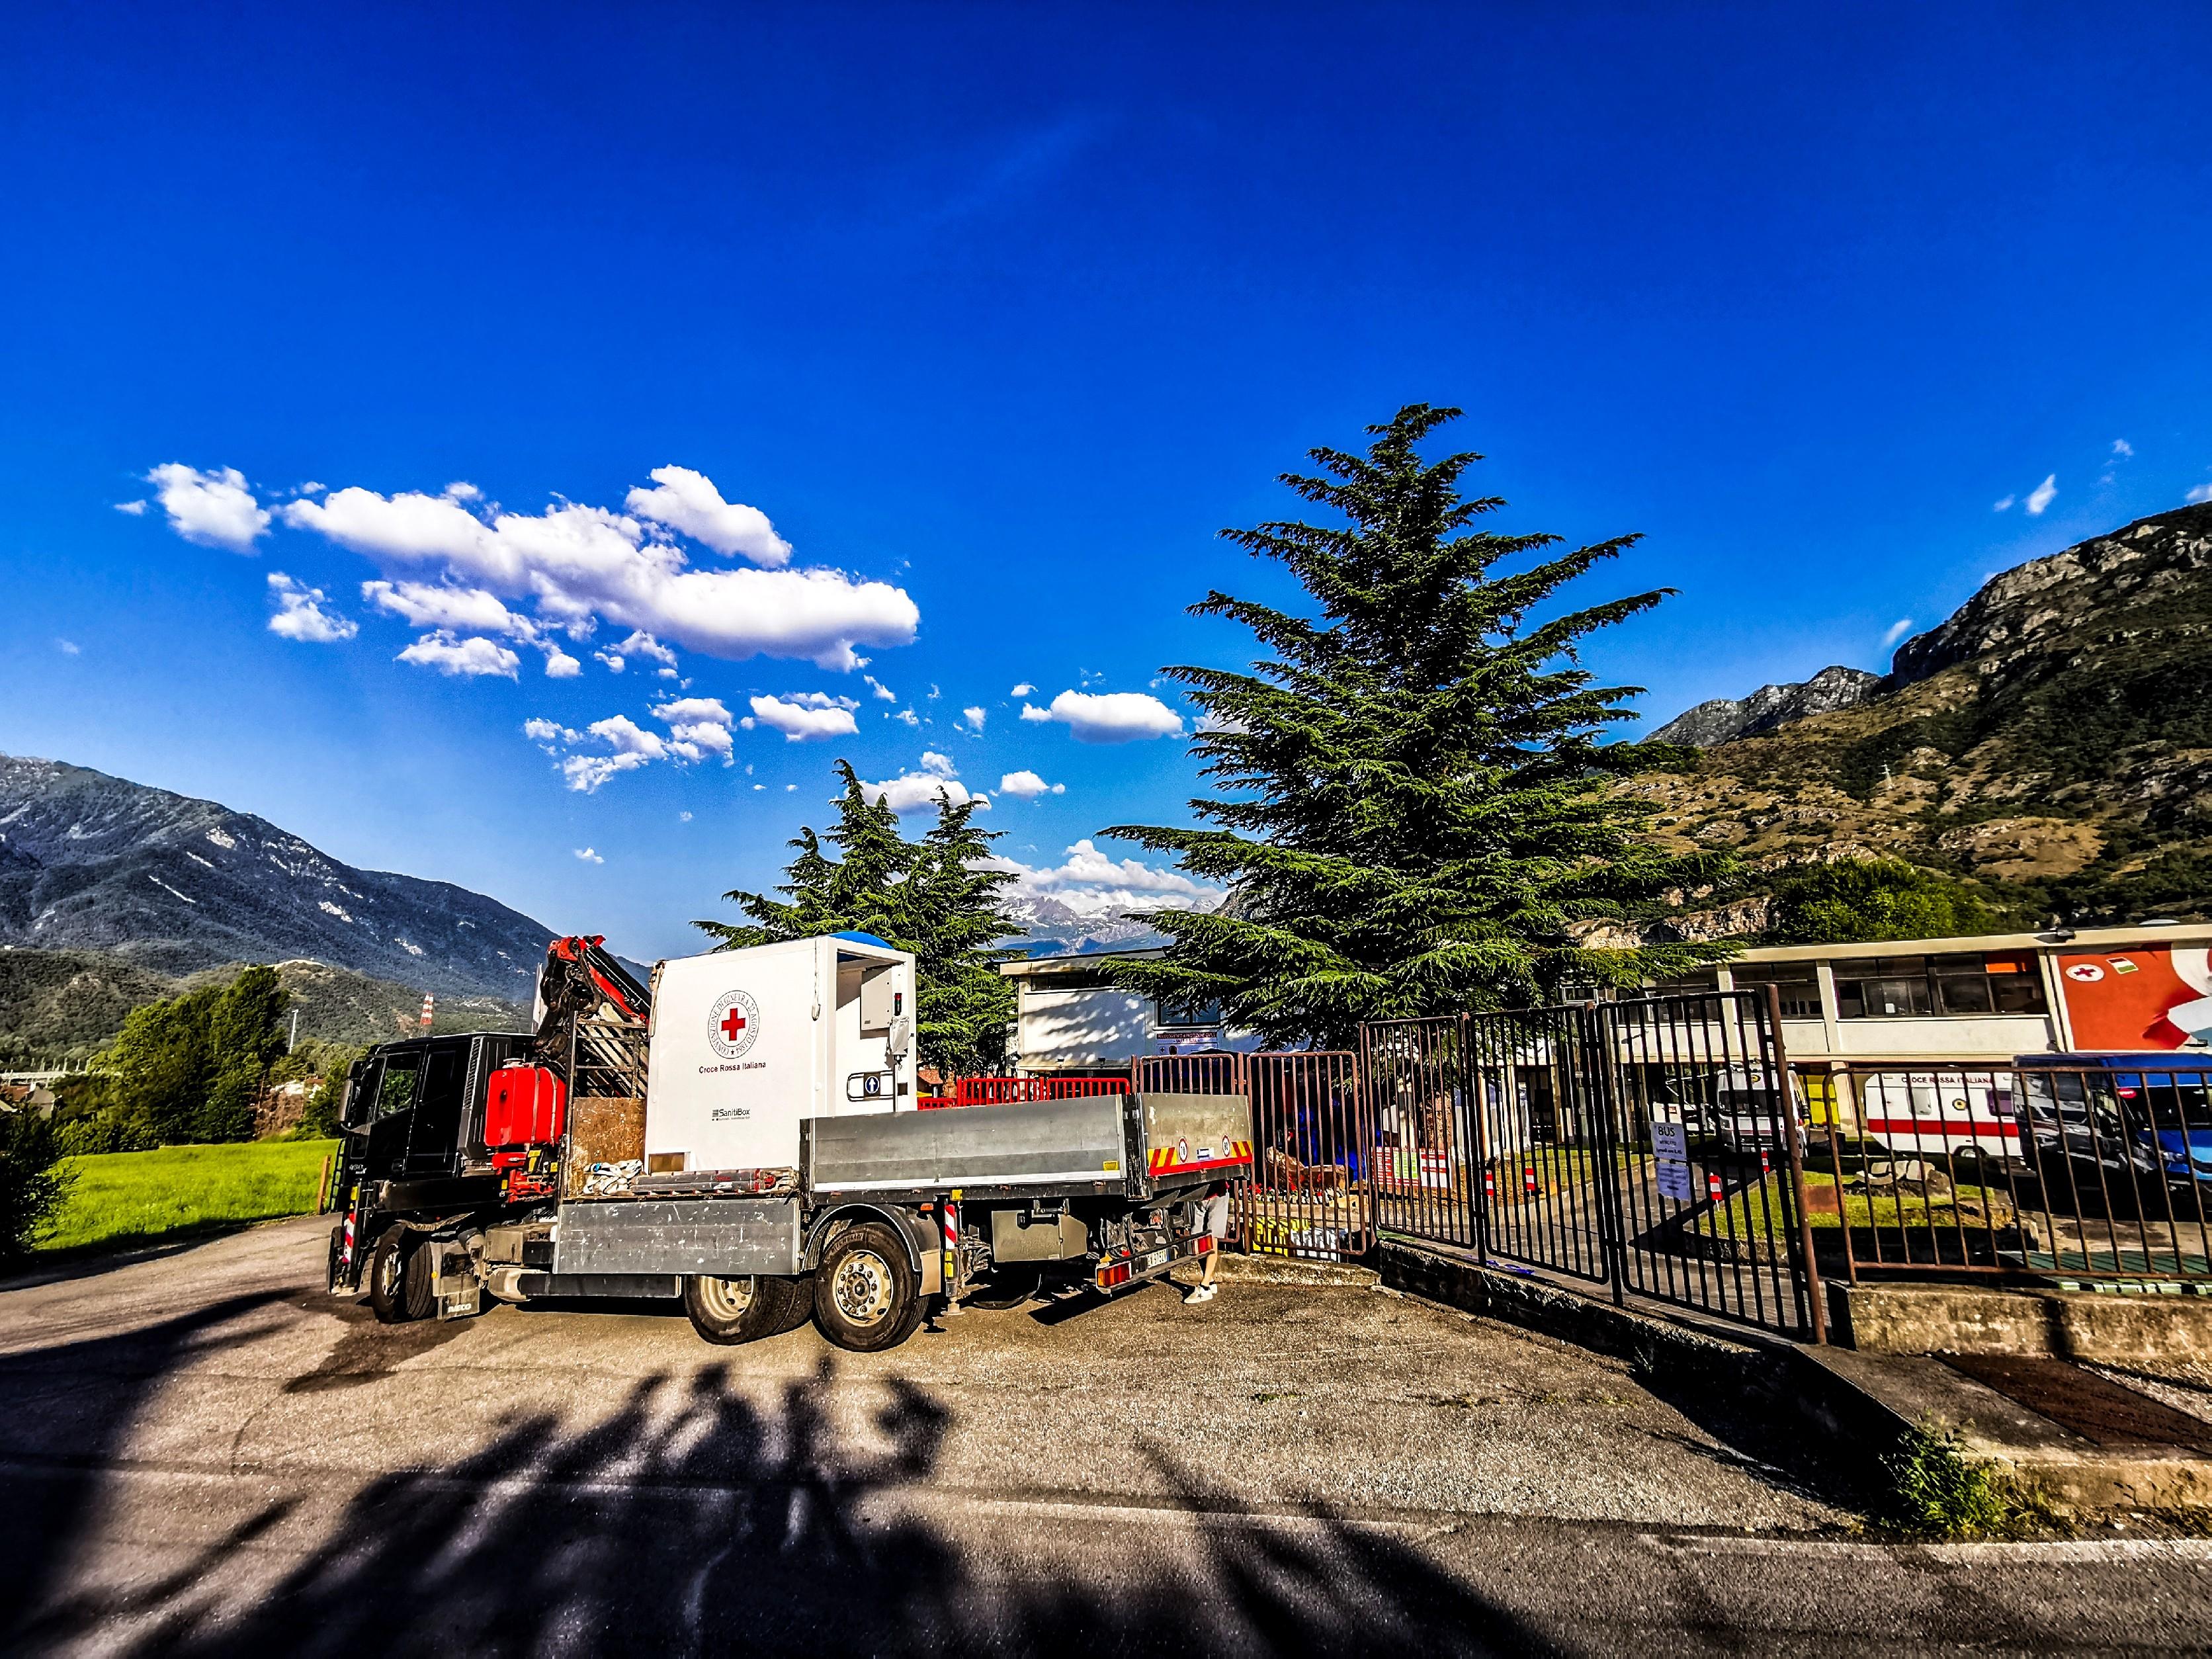 sprech dona un sanitibox a croce rossa italiana